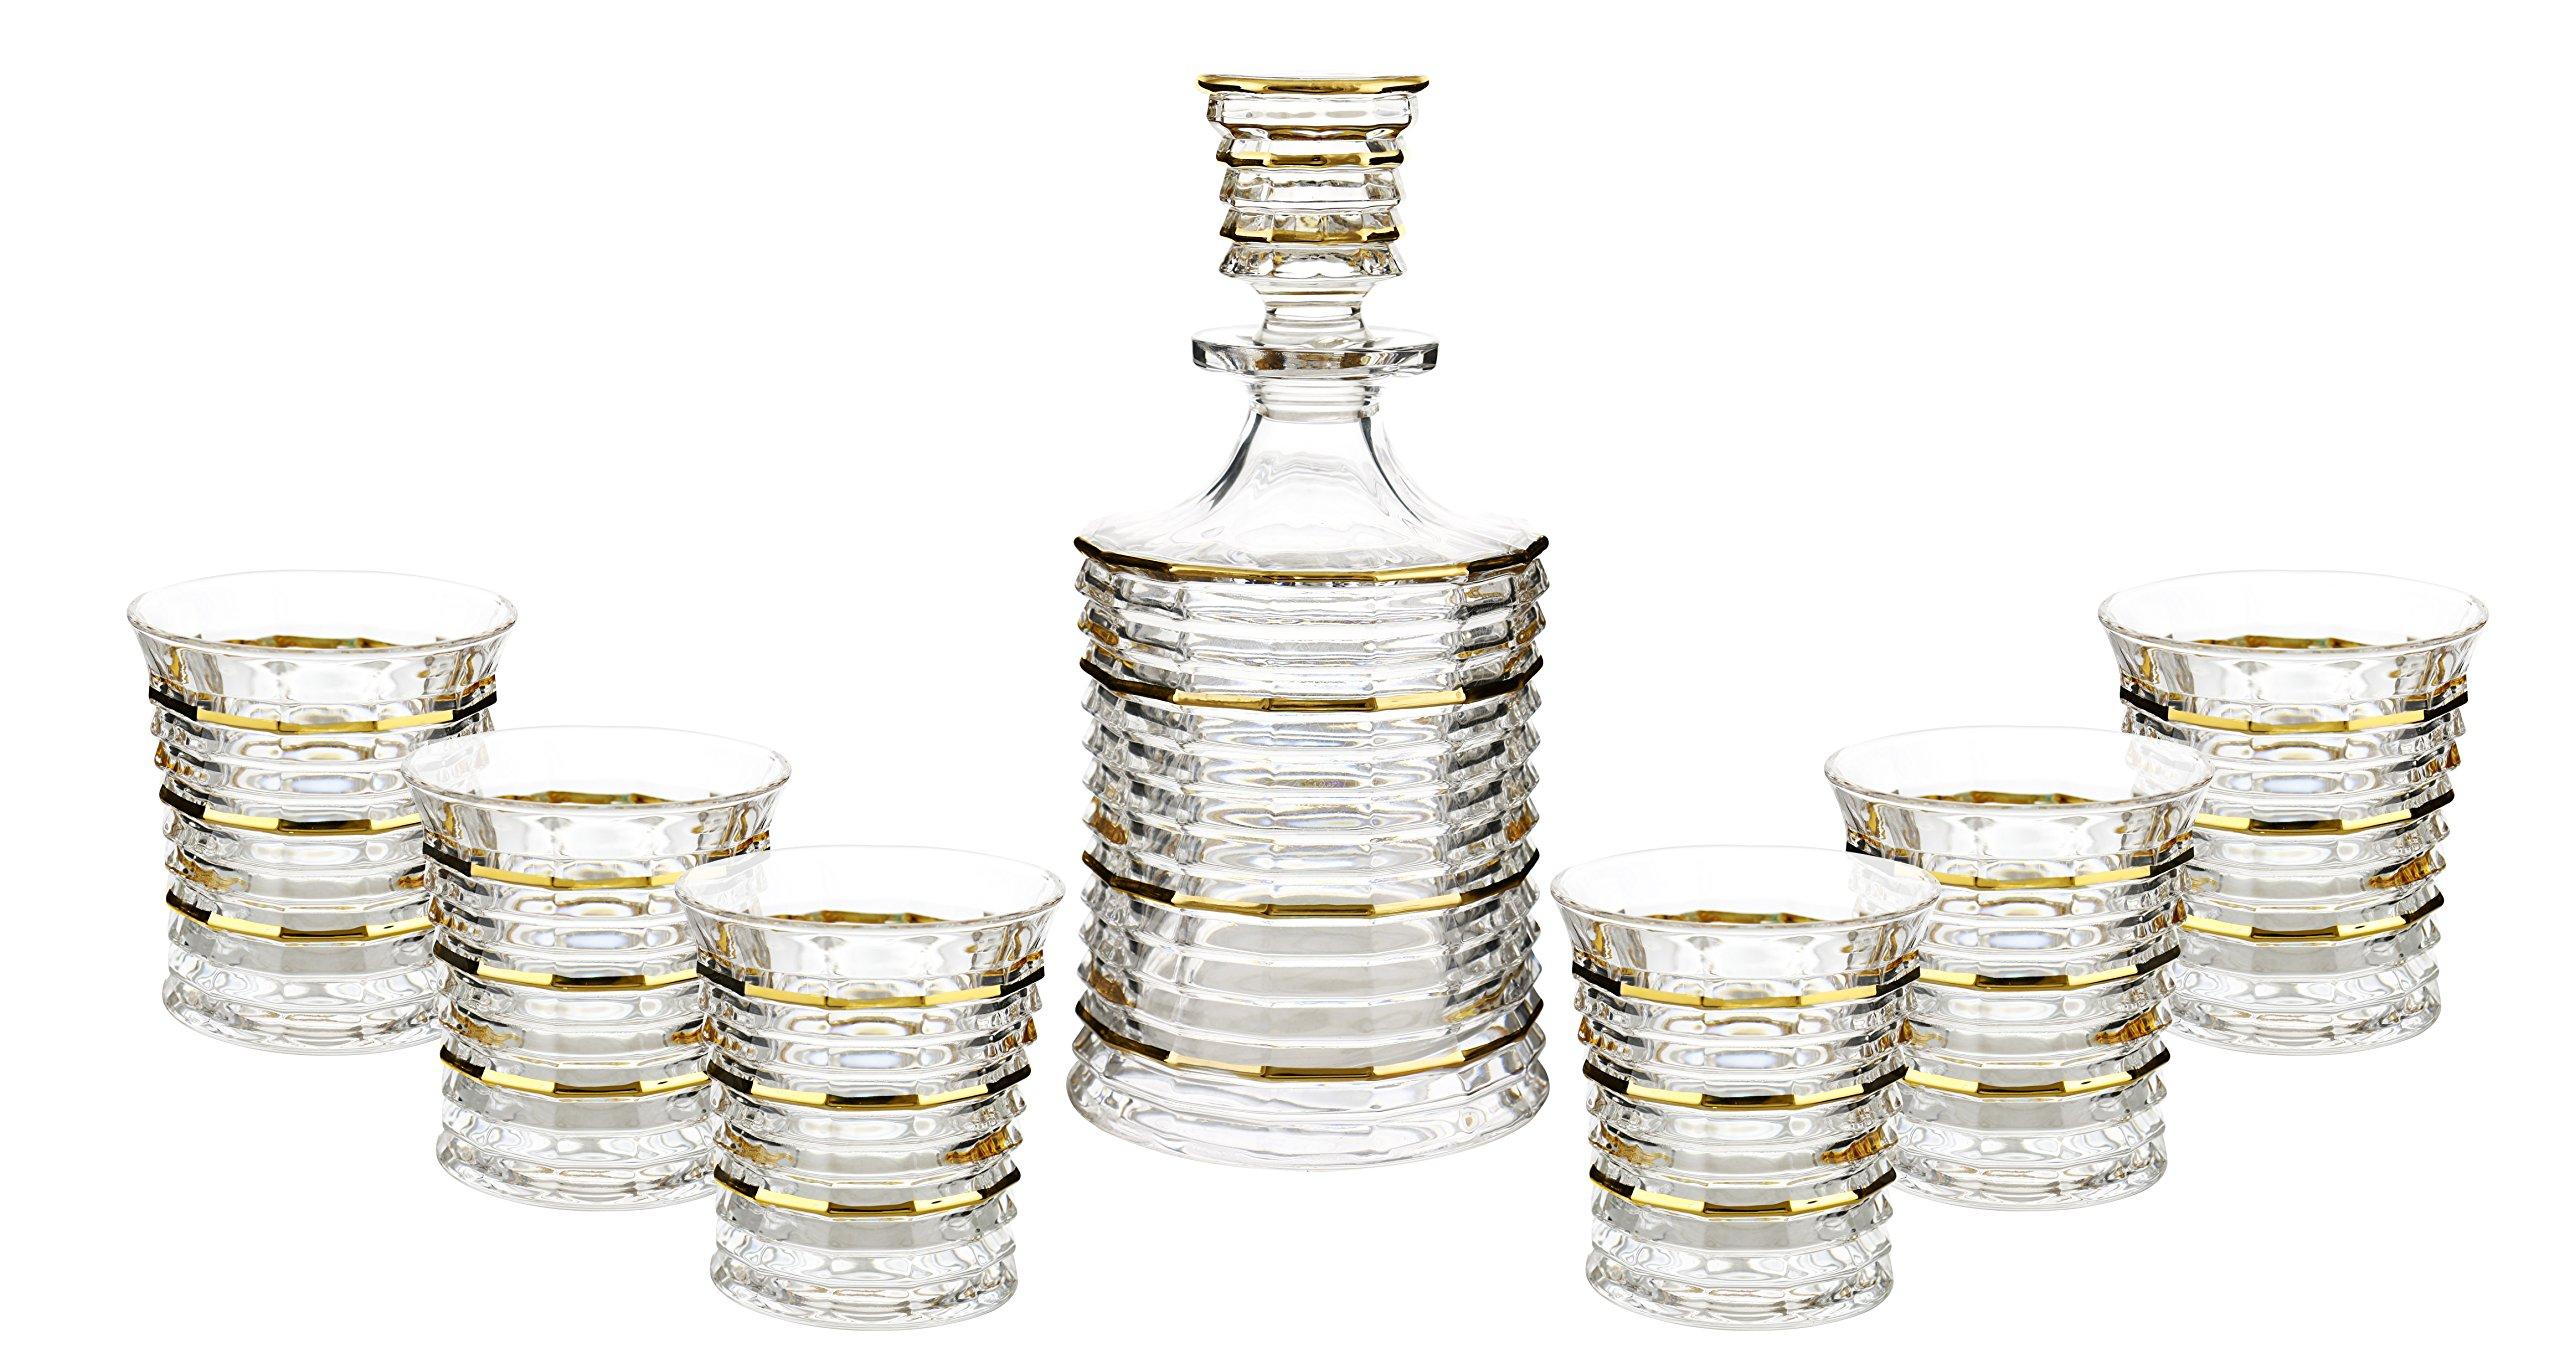 WINE BODIES ZG26205 Liquor Decanters Gold